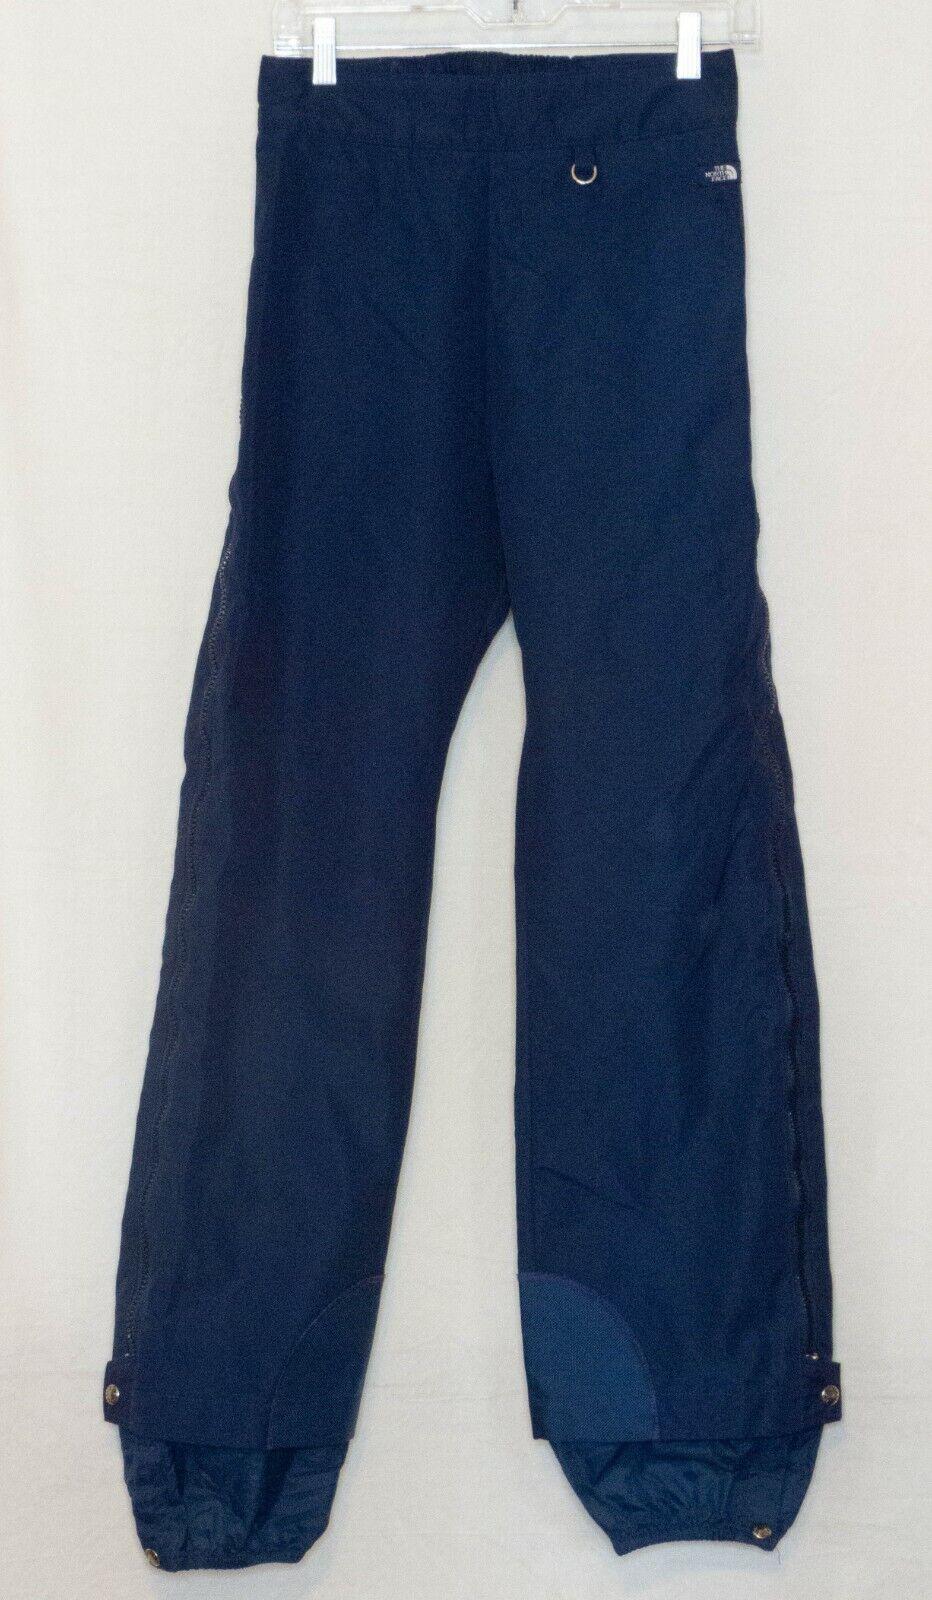 7aa399d62 North Face Gore Tex Ski Snowboard Pants Unisex sz S Navy Side Zippers both  Legs